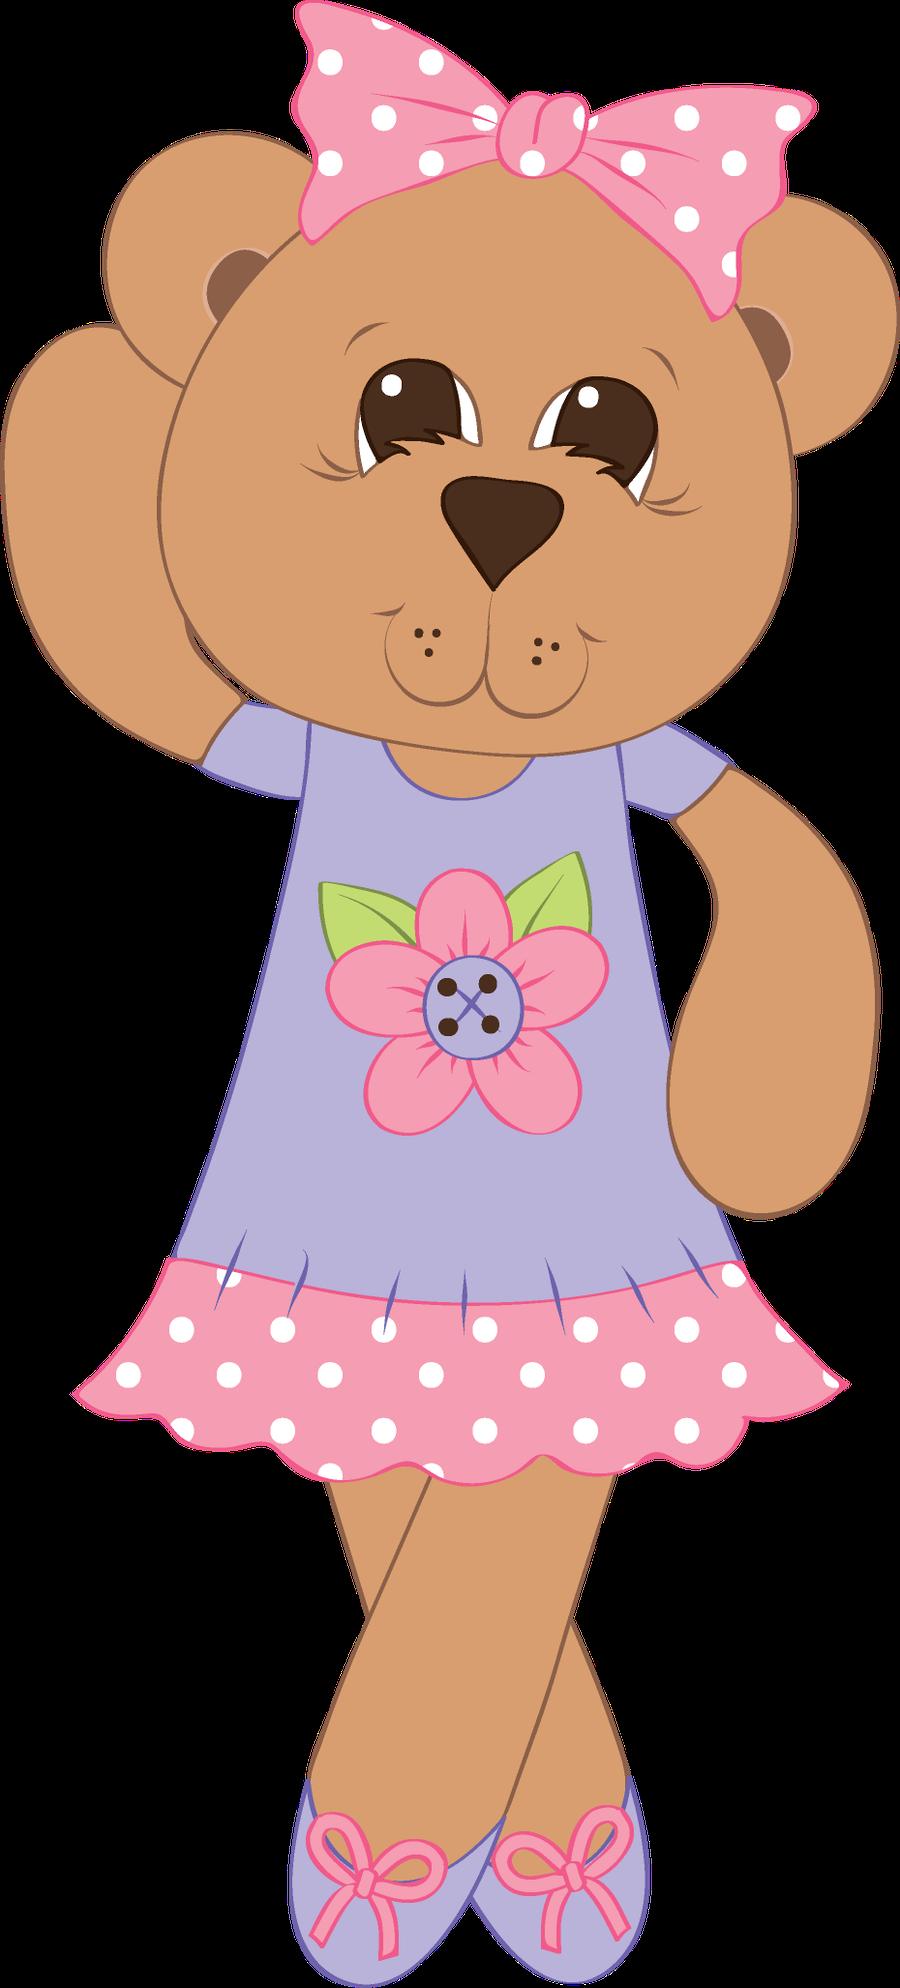 Ursinhos e ursinhas - Minus | Ursinhos | Pinterest | Nähen